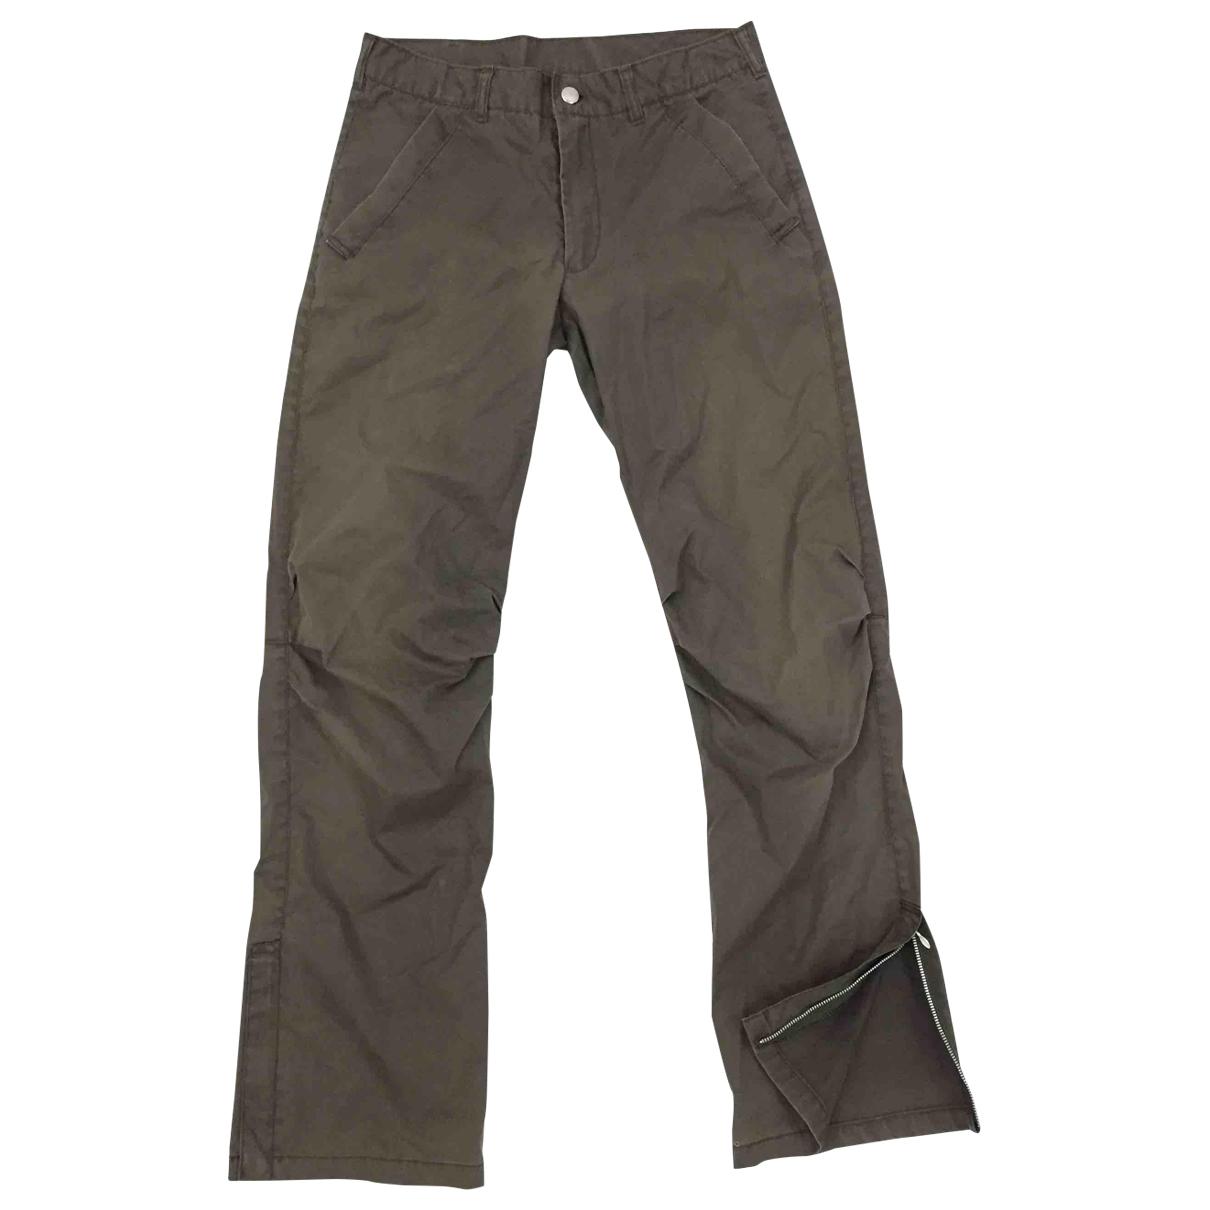 Pantalones en Algodon Marron Katharine Hamnett